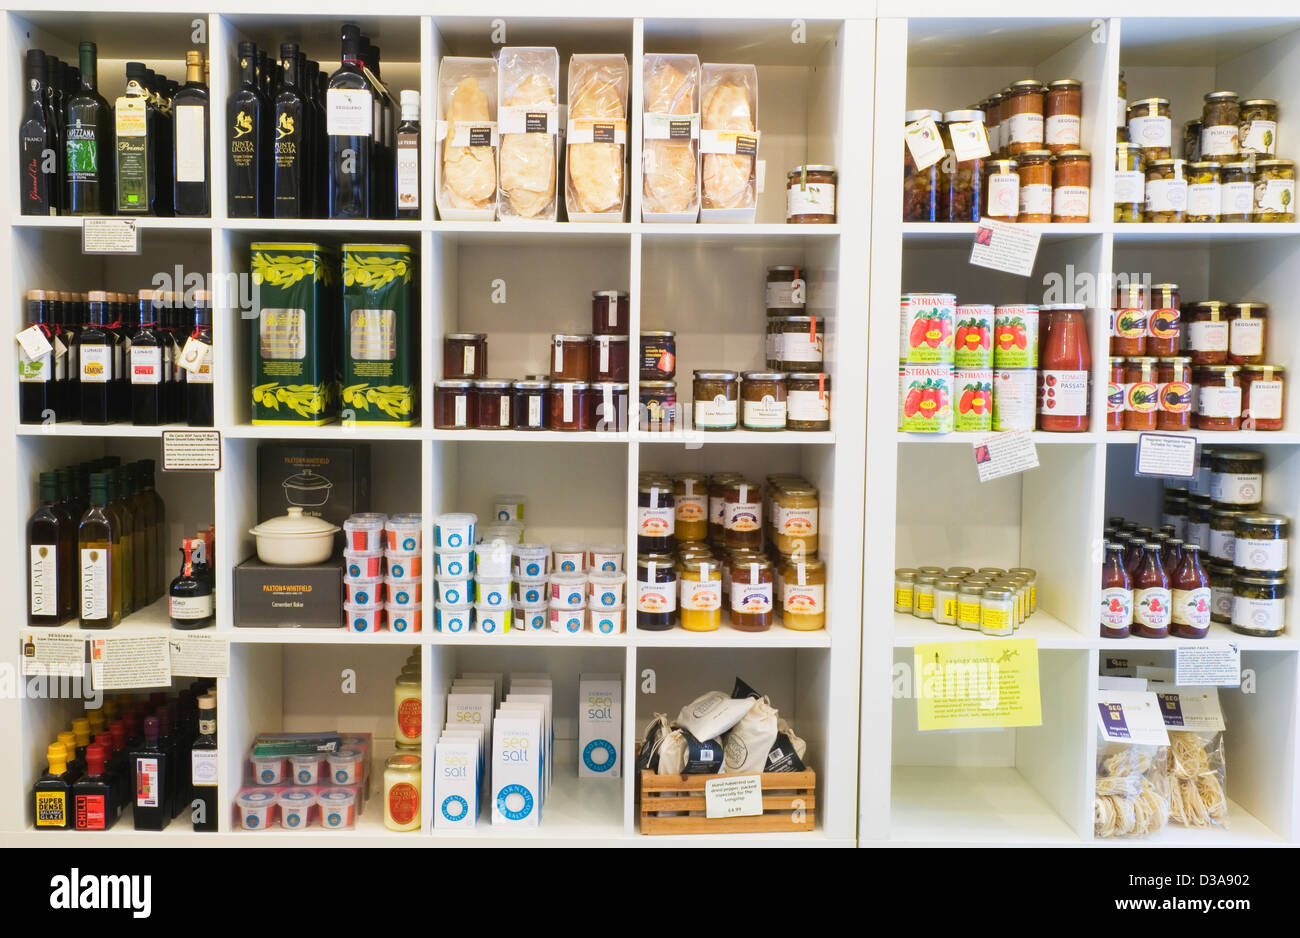 Delicatessen Shelves Stockfotos & Delicatessen Shelves Bilder - Alamy